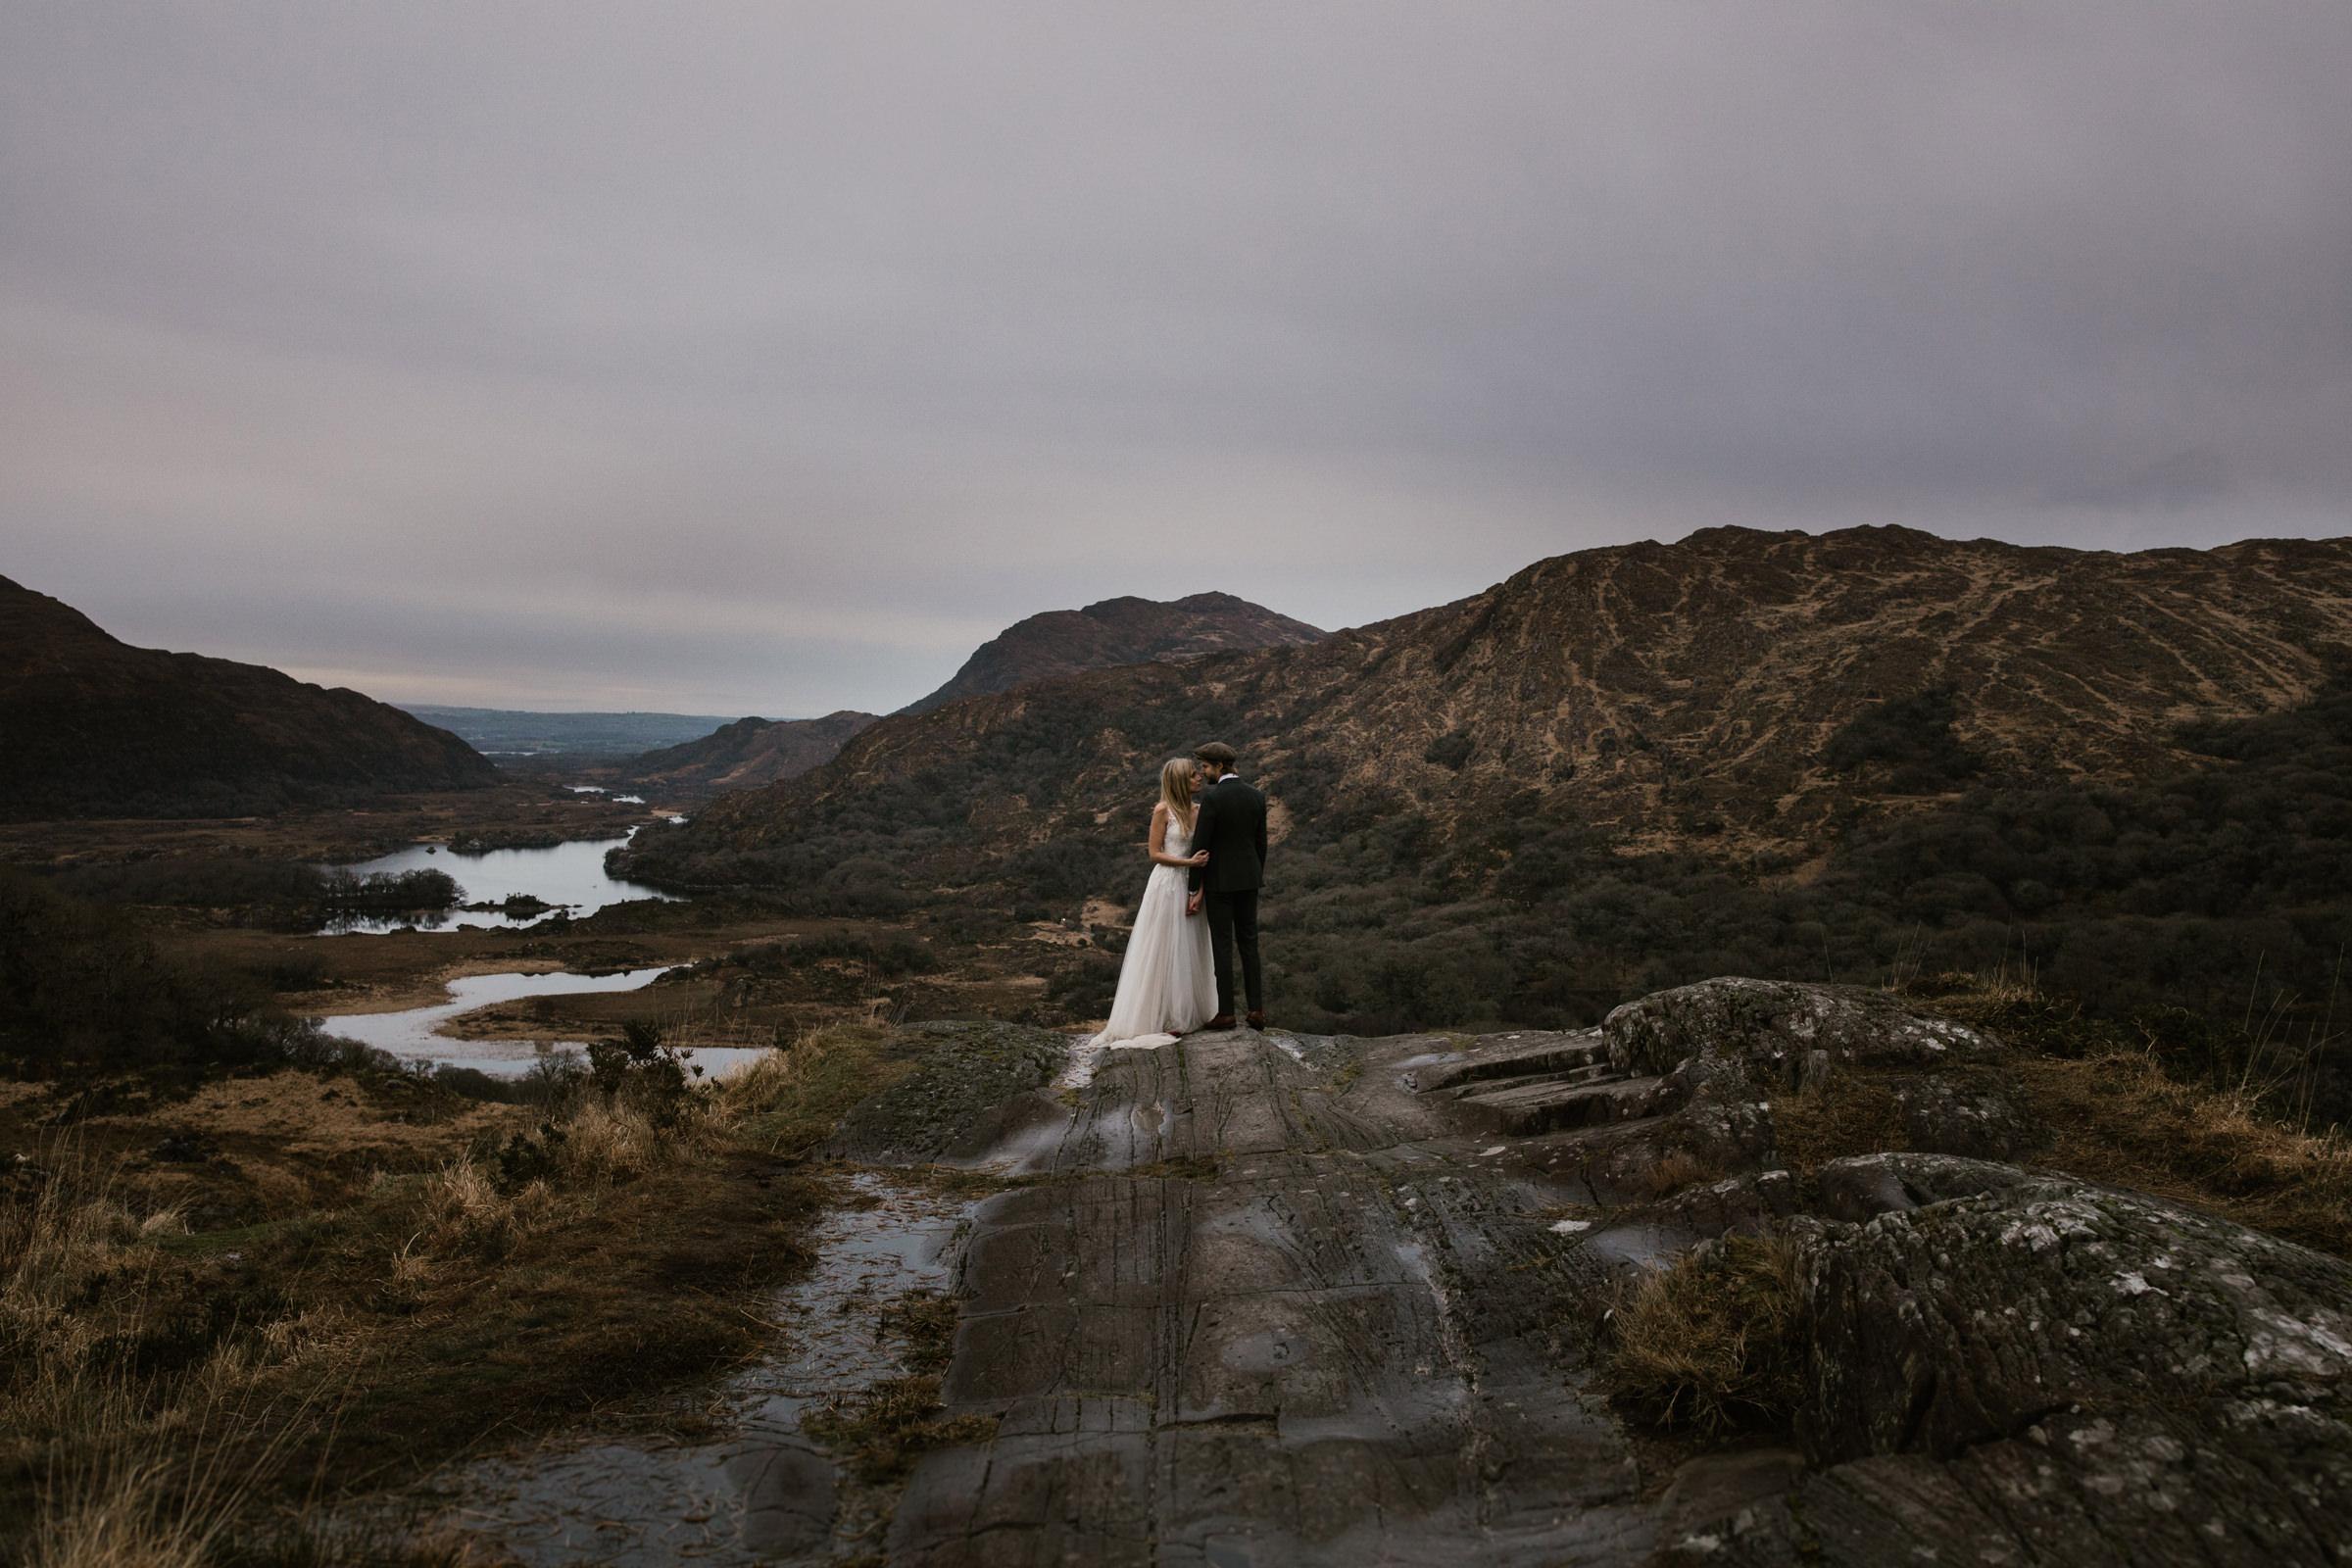 Couple in Scottish landscape - photo by White Cat Studio